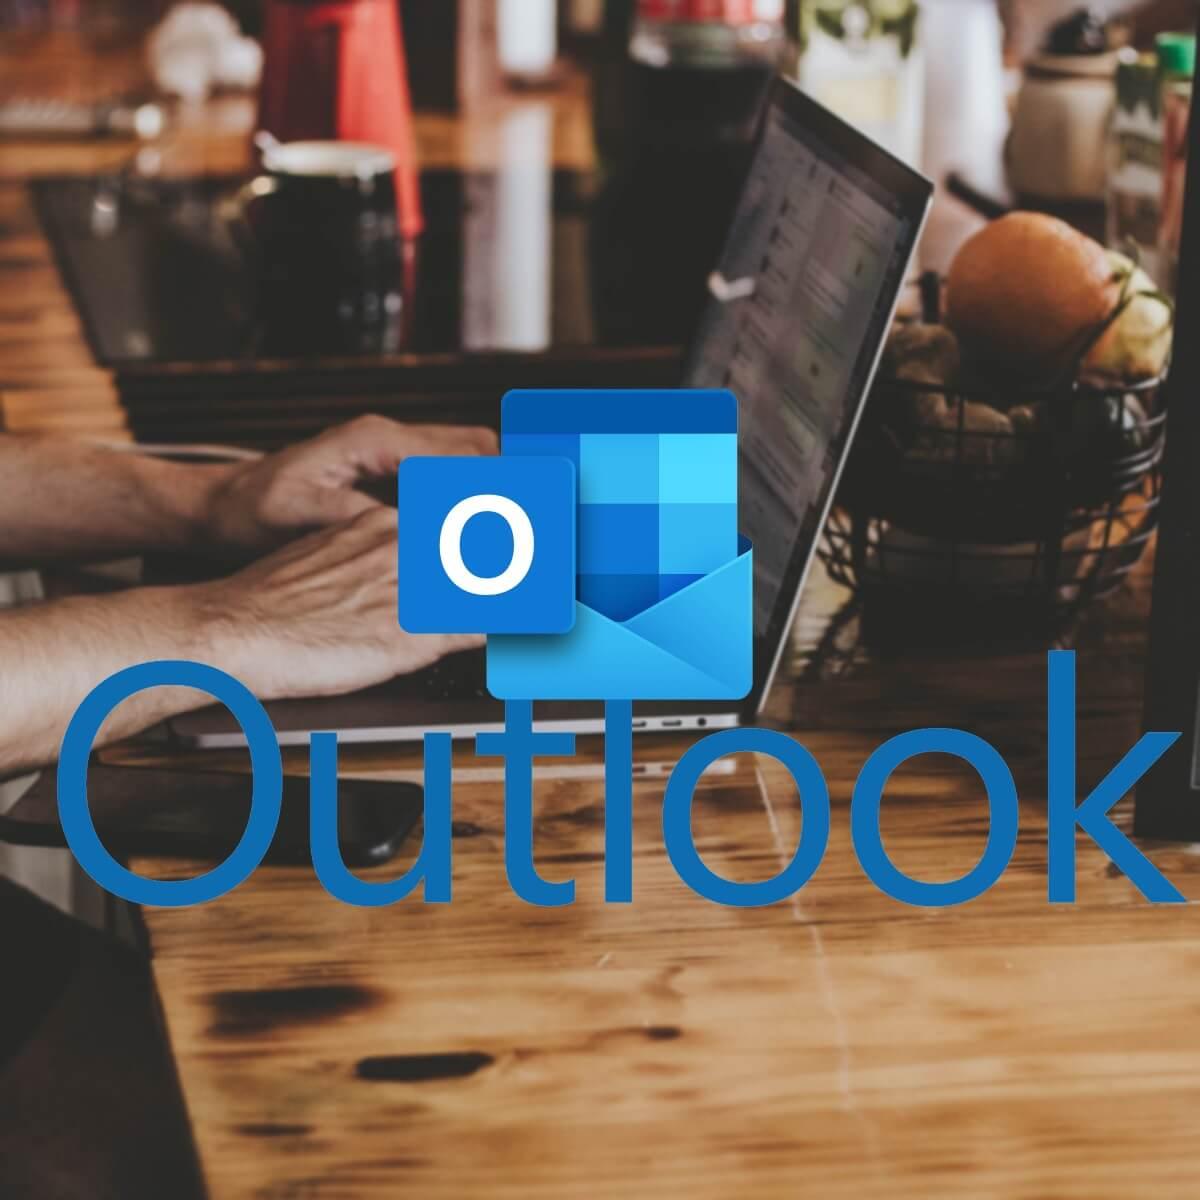 Curso online Outlook 2013